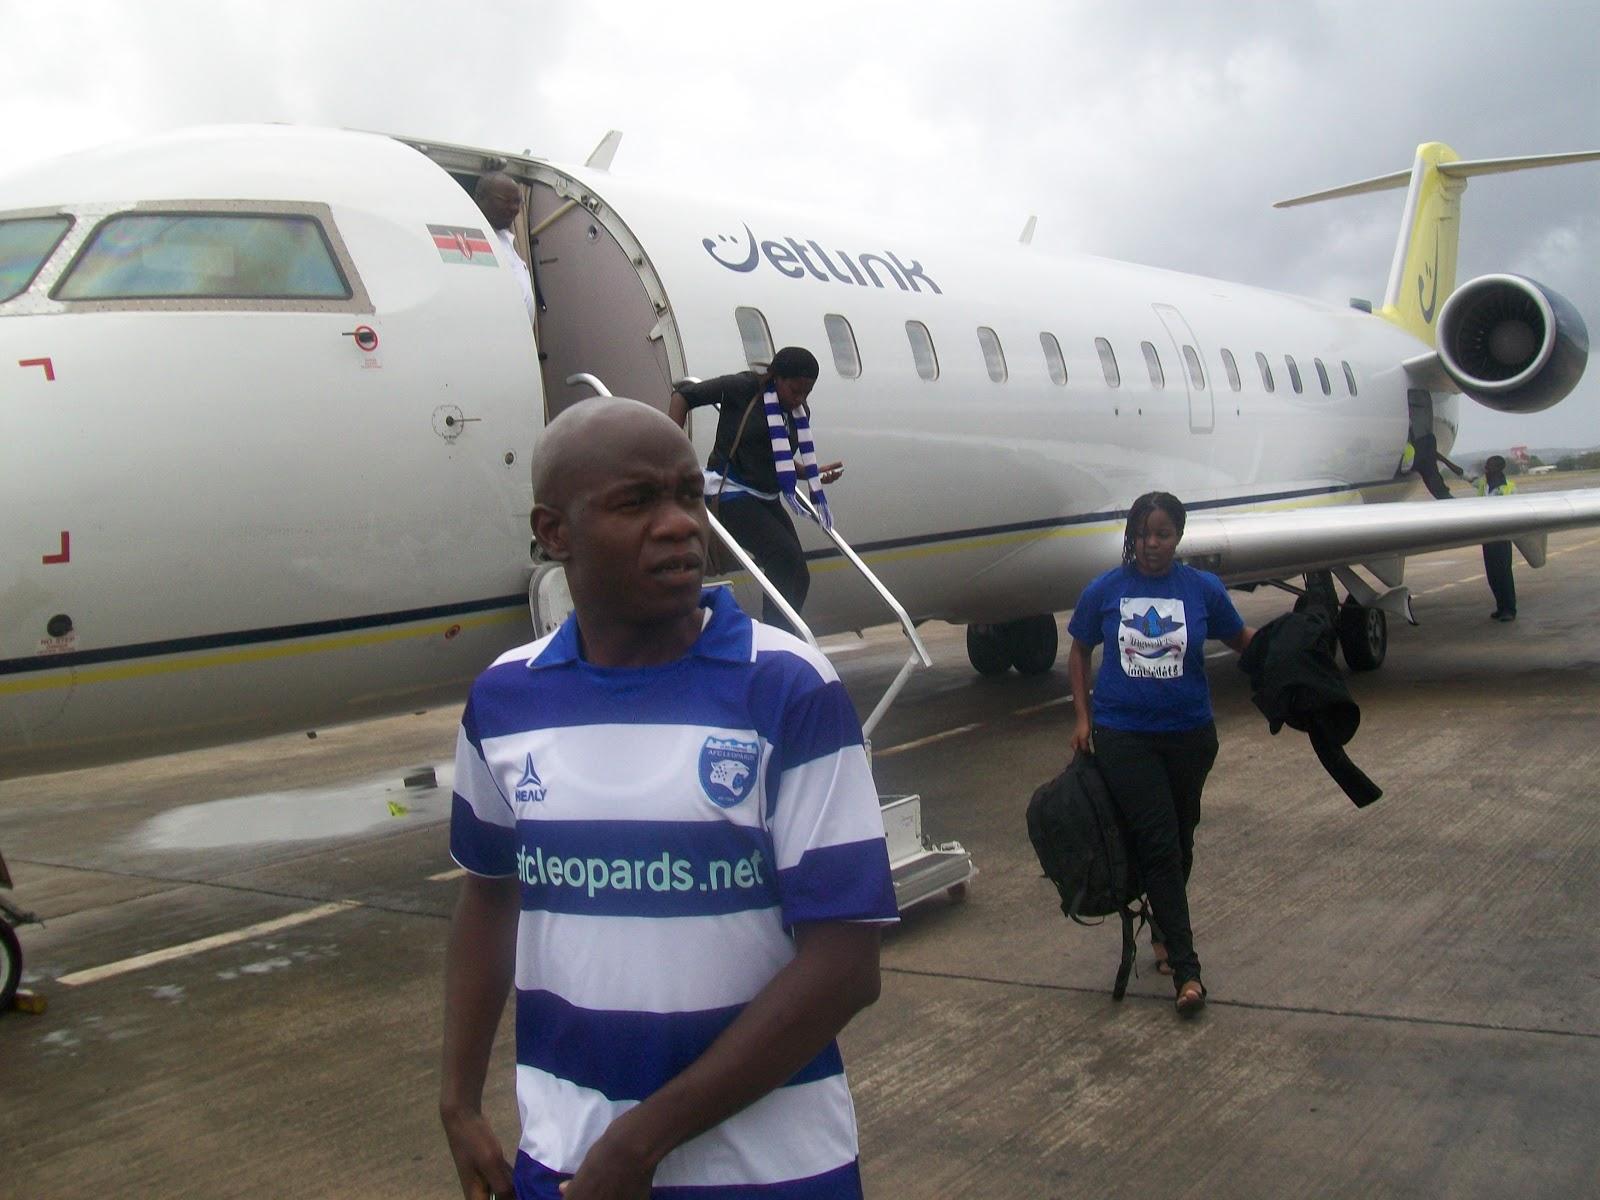 How soccer can actualise AU single aviation market quest